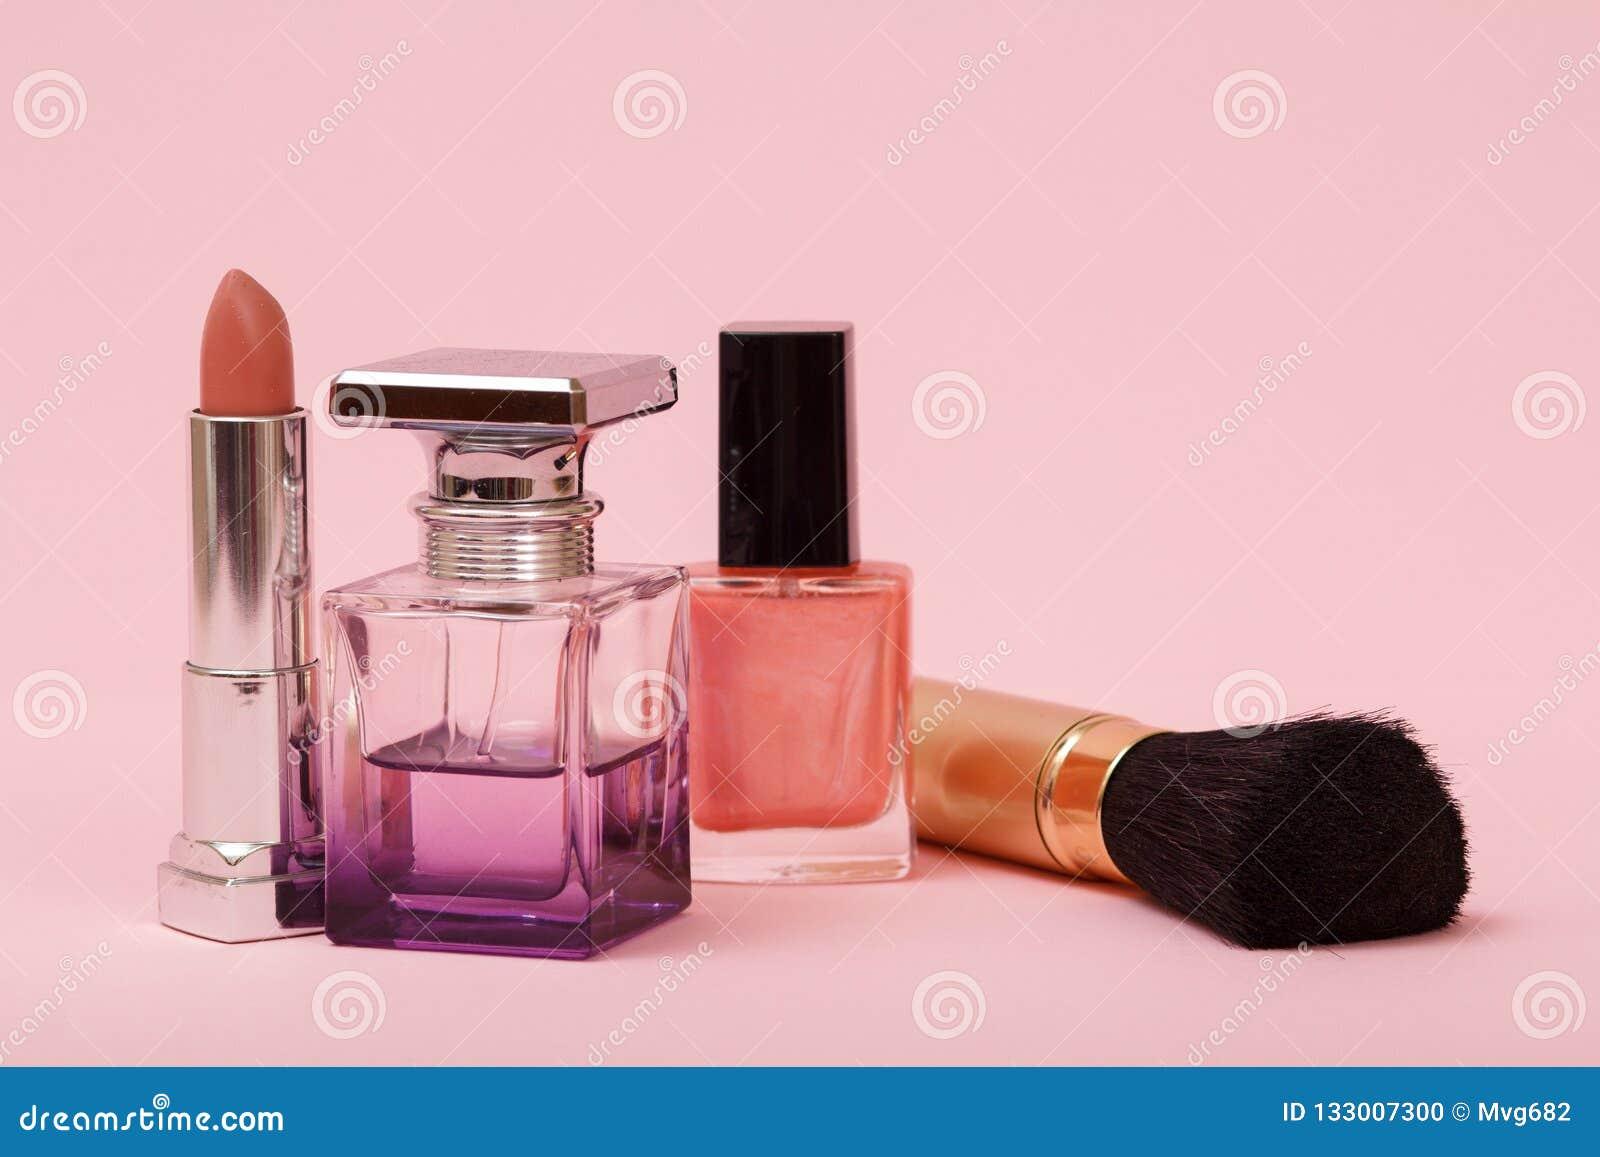 b4ea12098e2 Το άρωμα γυναικών, μπουκάλια με το καρφί γυαλίζει, βούρτσα και κραγιόν σε  ένα ρόδινο υπόβαθρο Καλλυντικά και αρώματα γυναικών